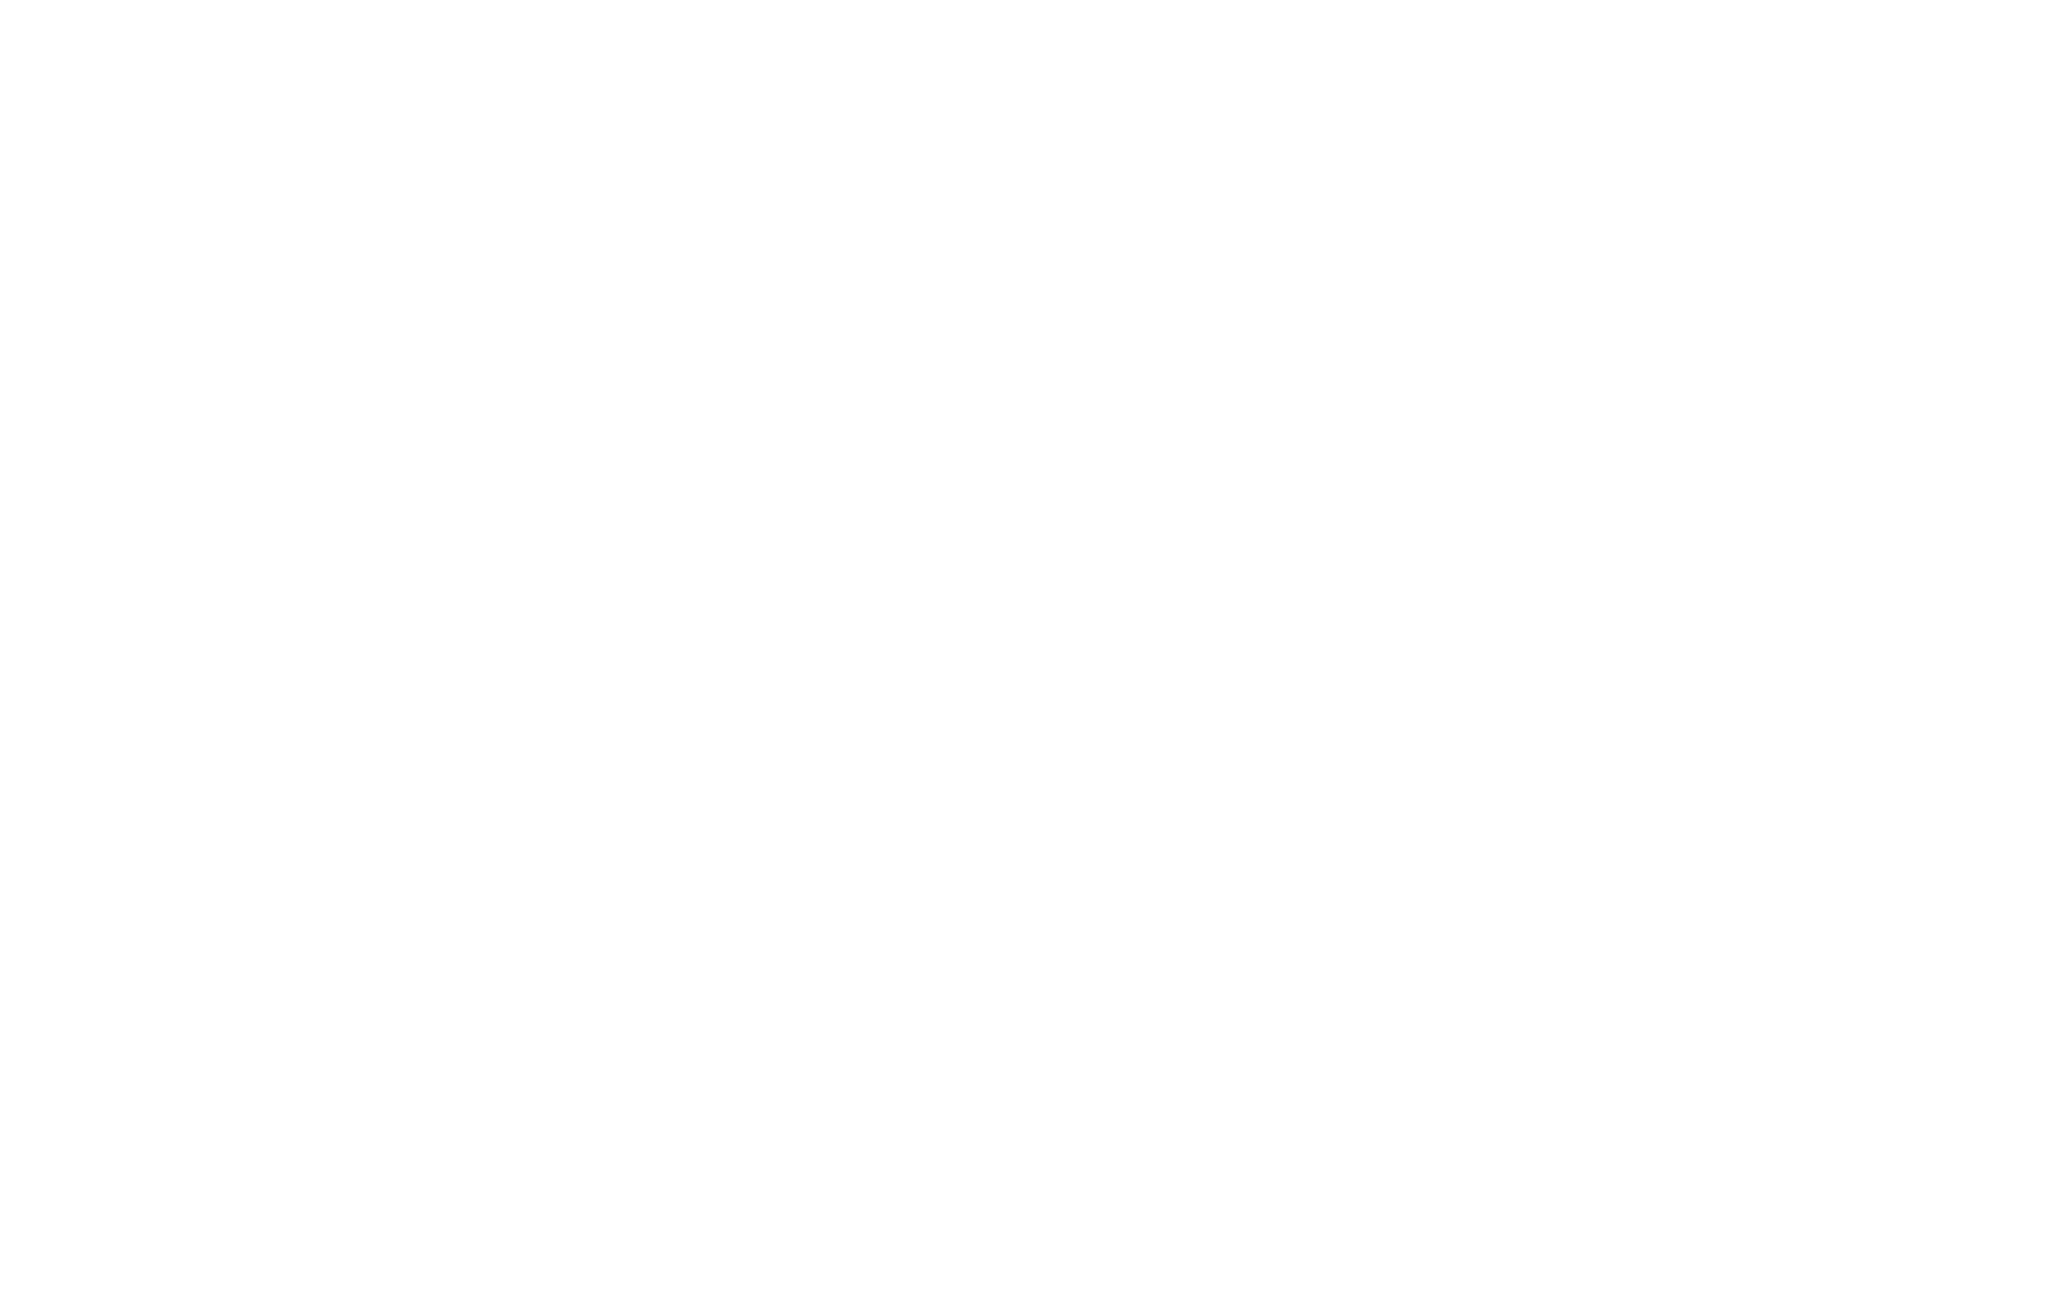 News Logos_v03 The Times.png